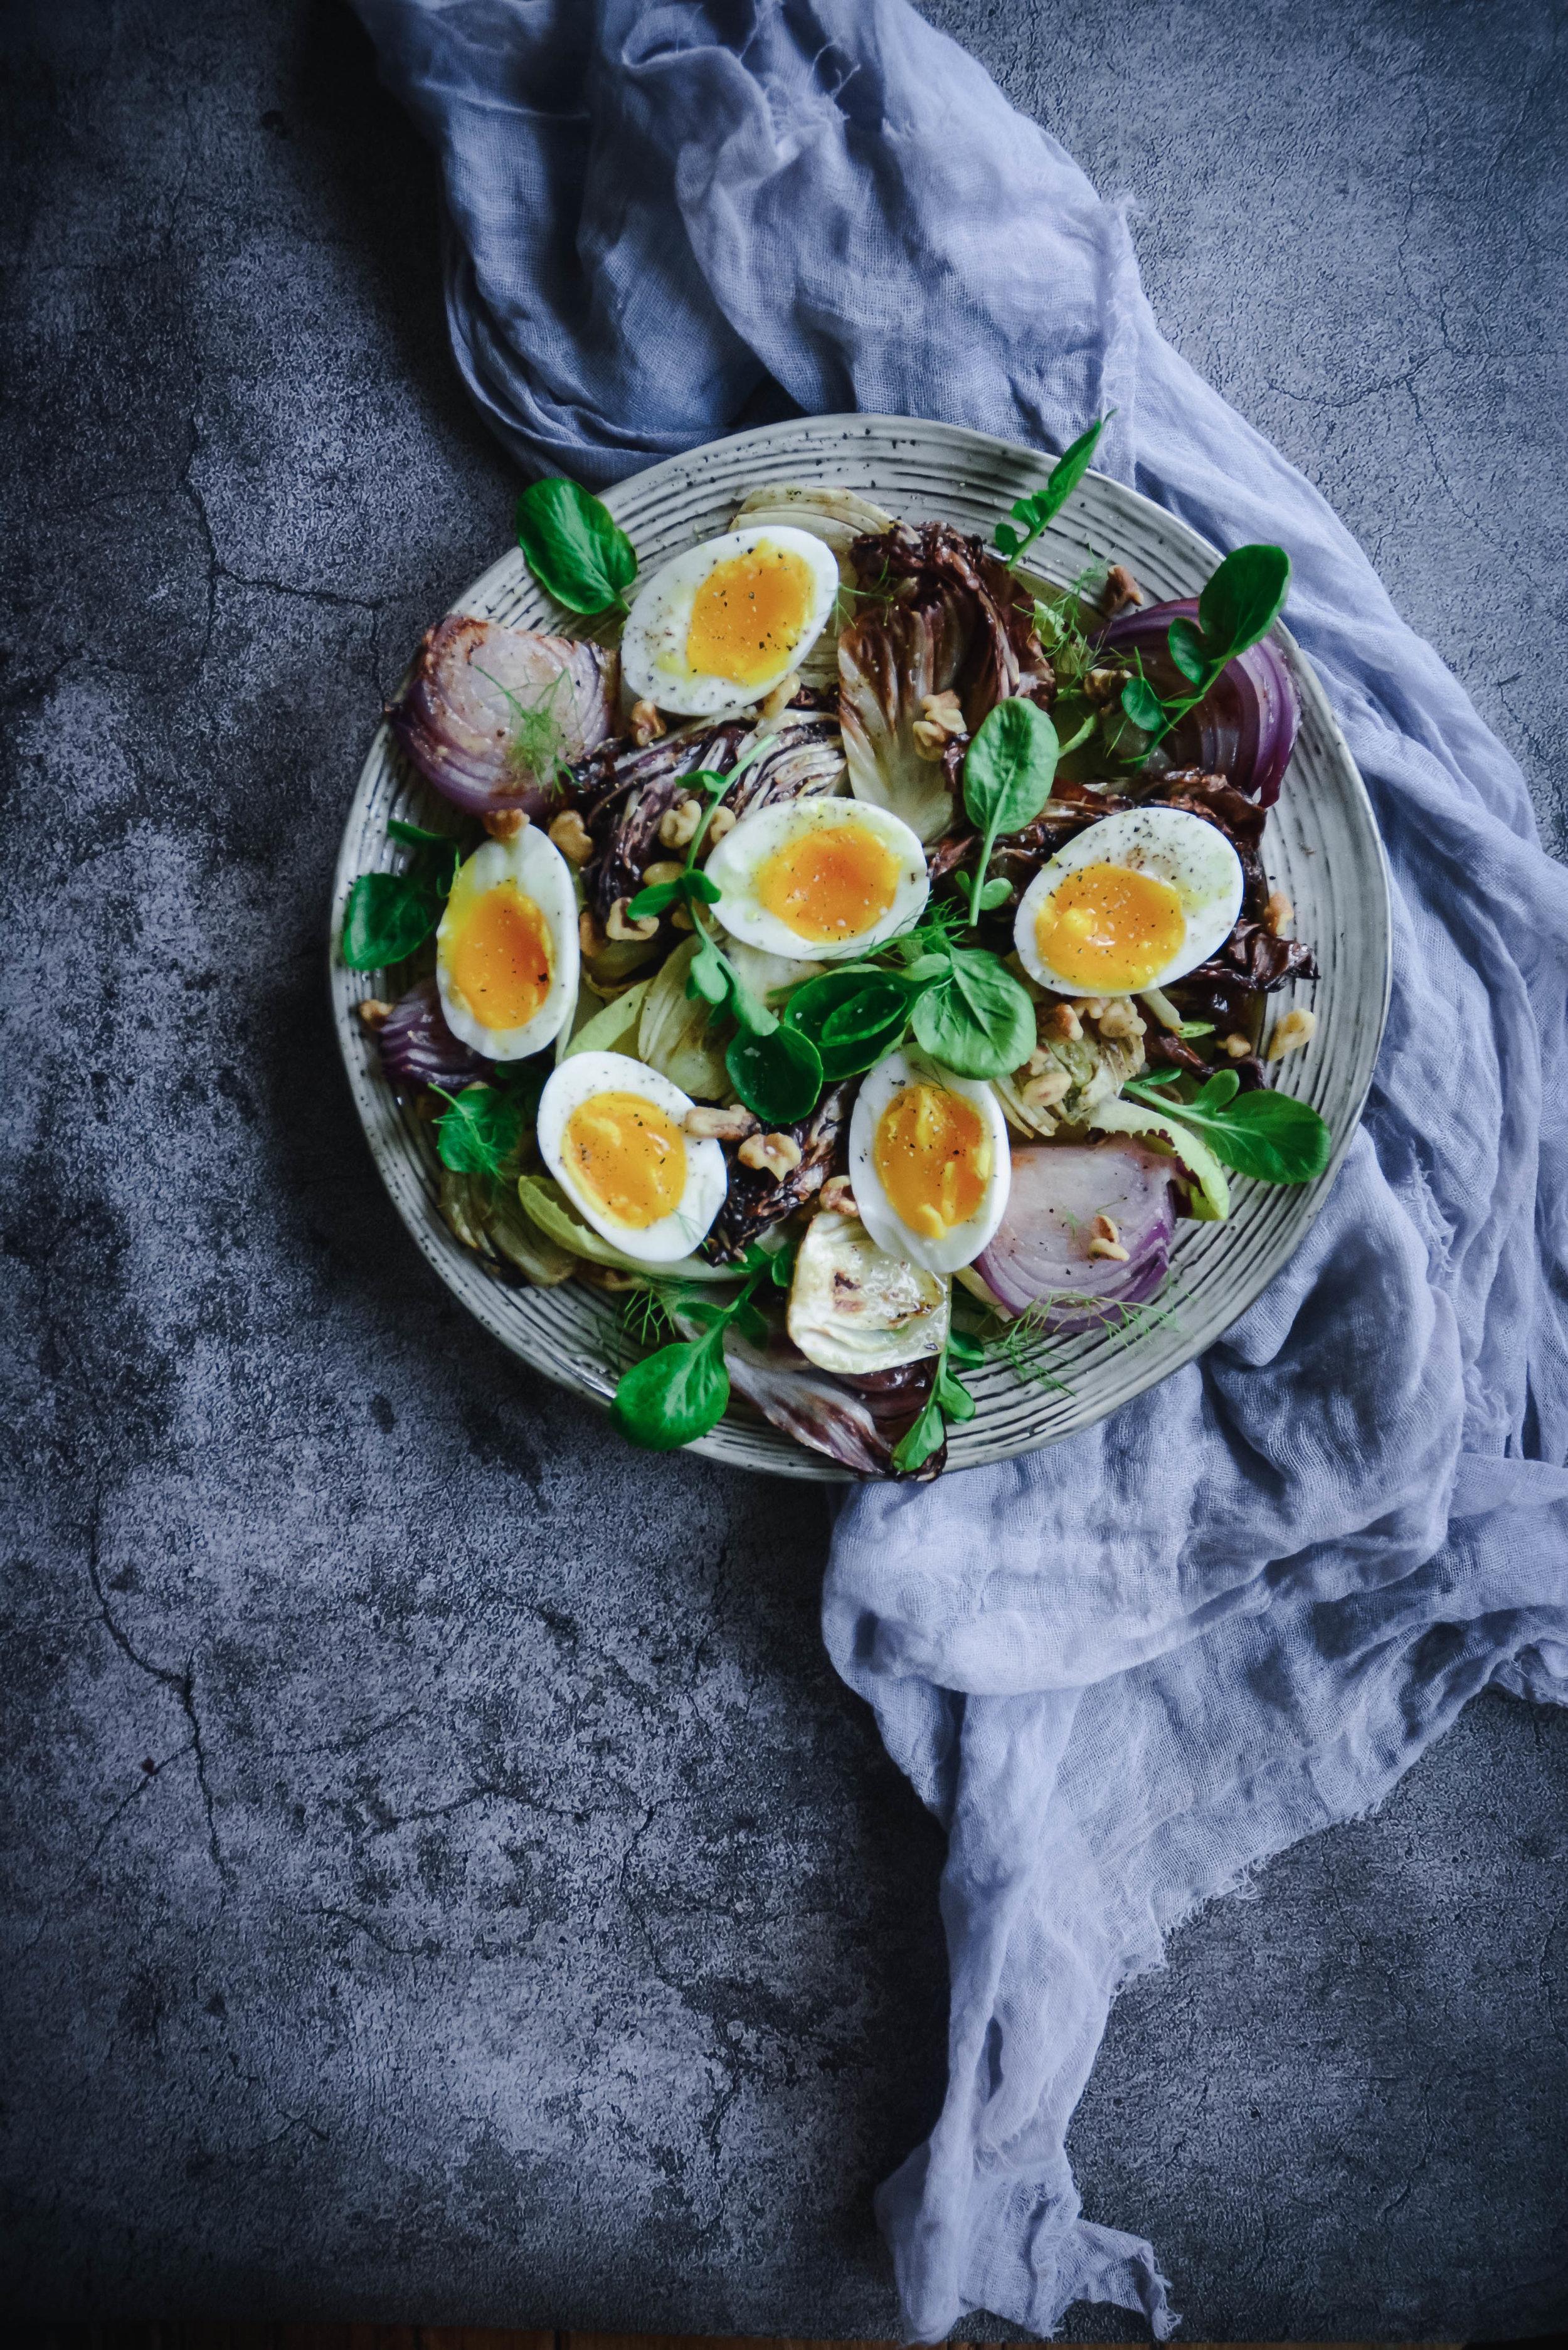 Radicchio salad with eggs on napkin